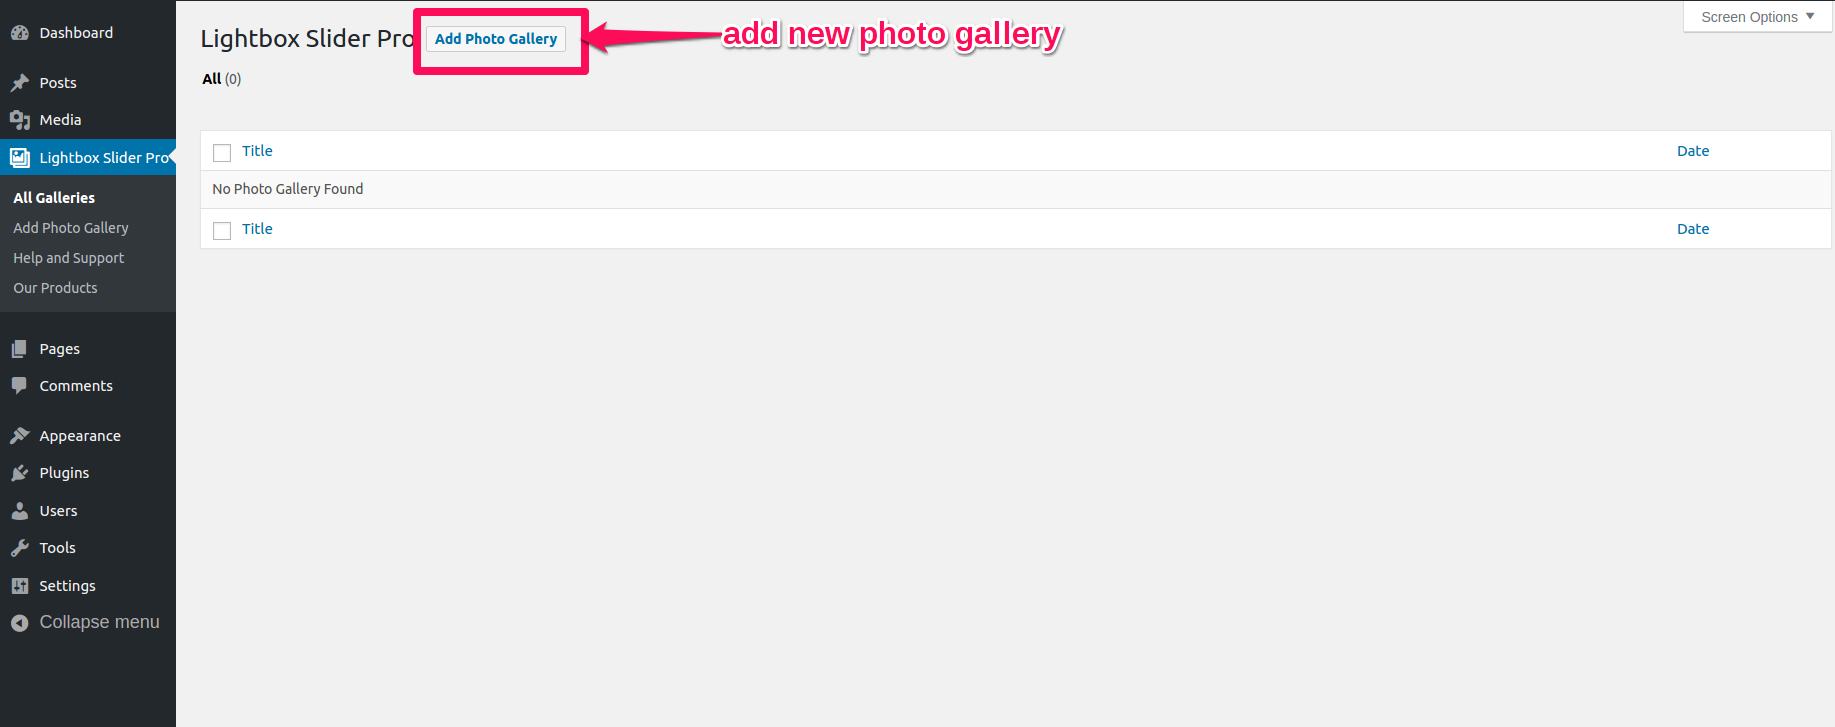 lbsp-click-add-new-gallery